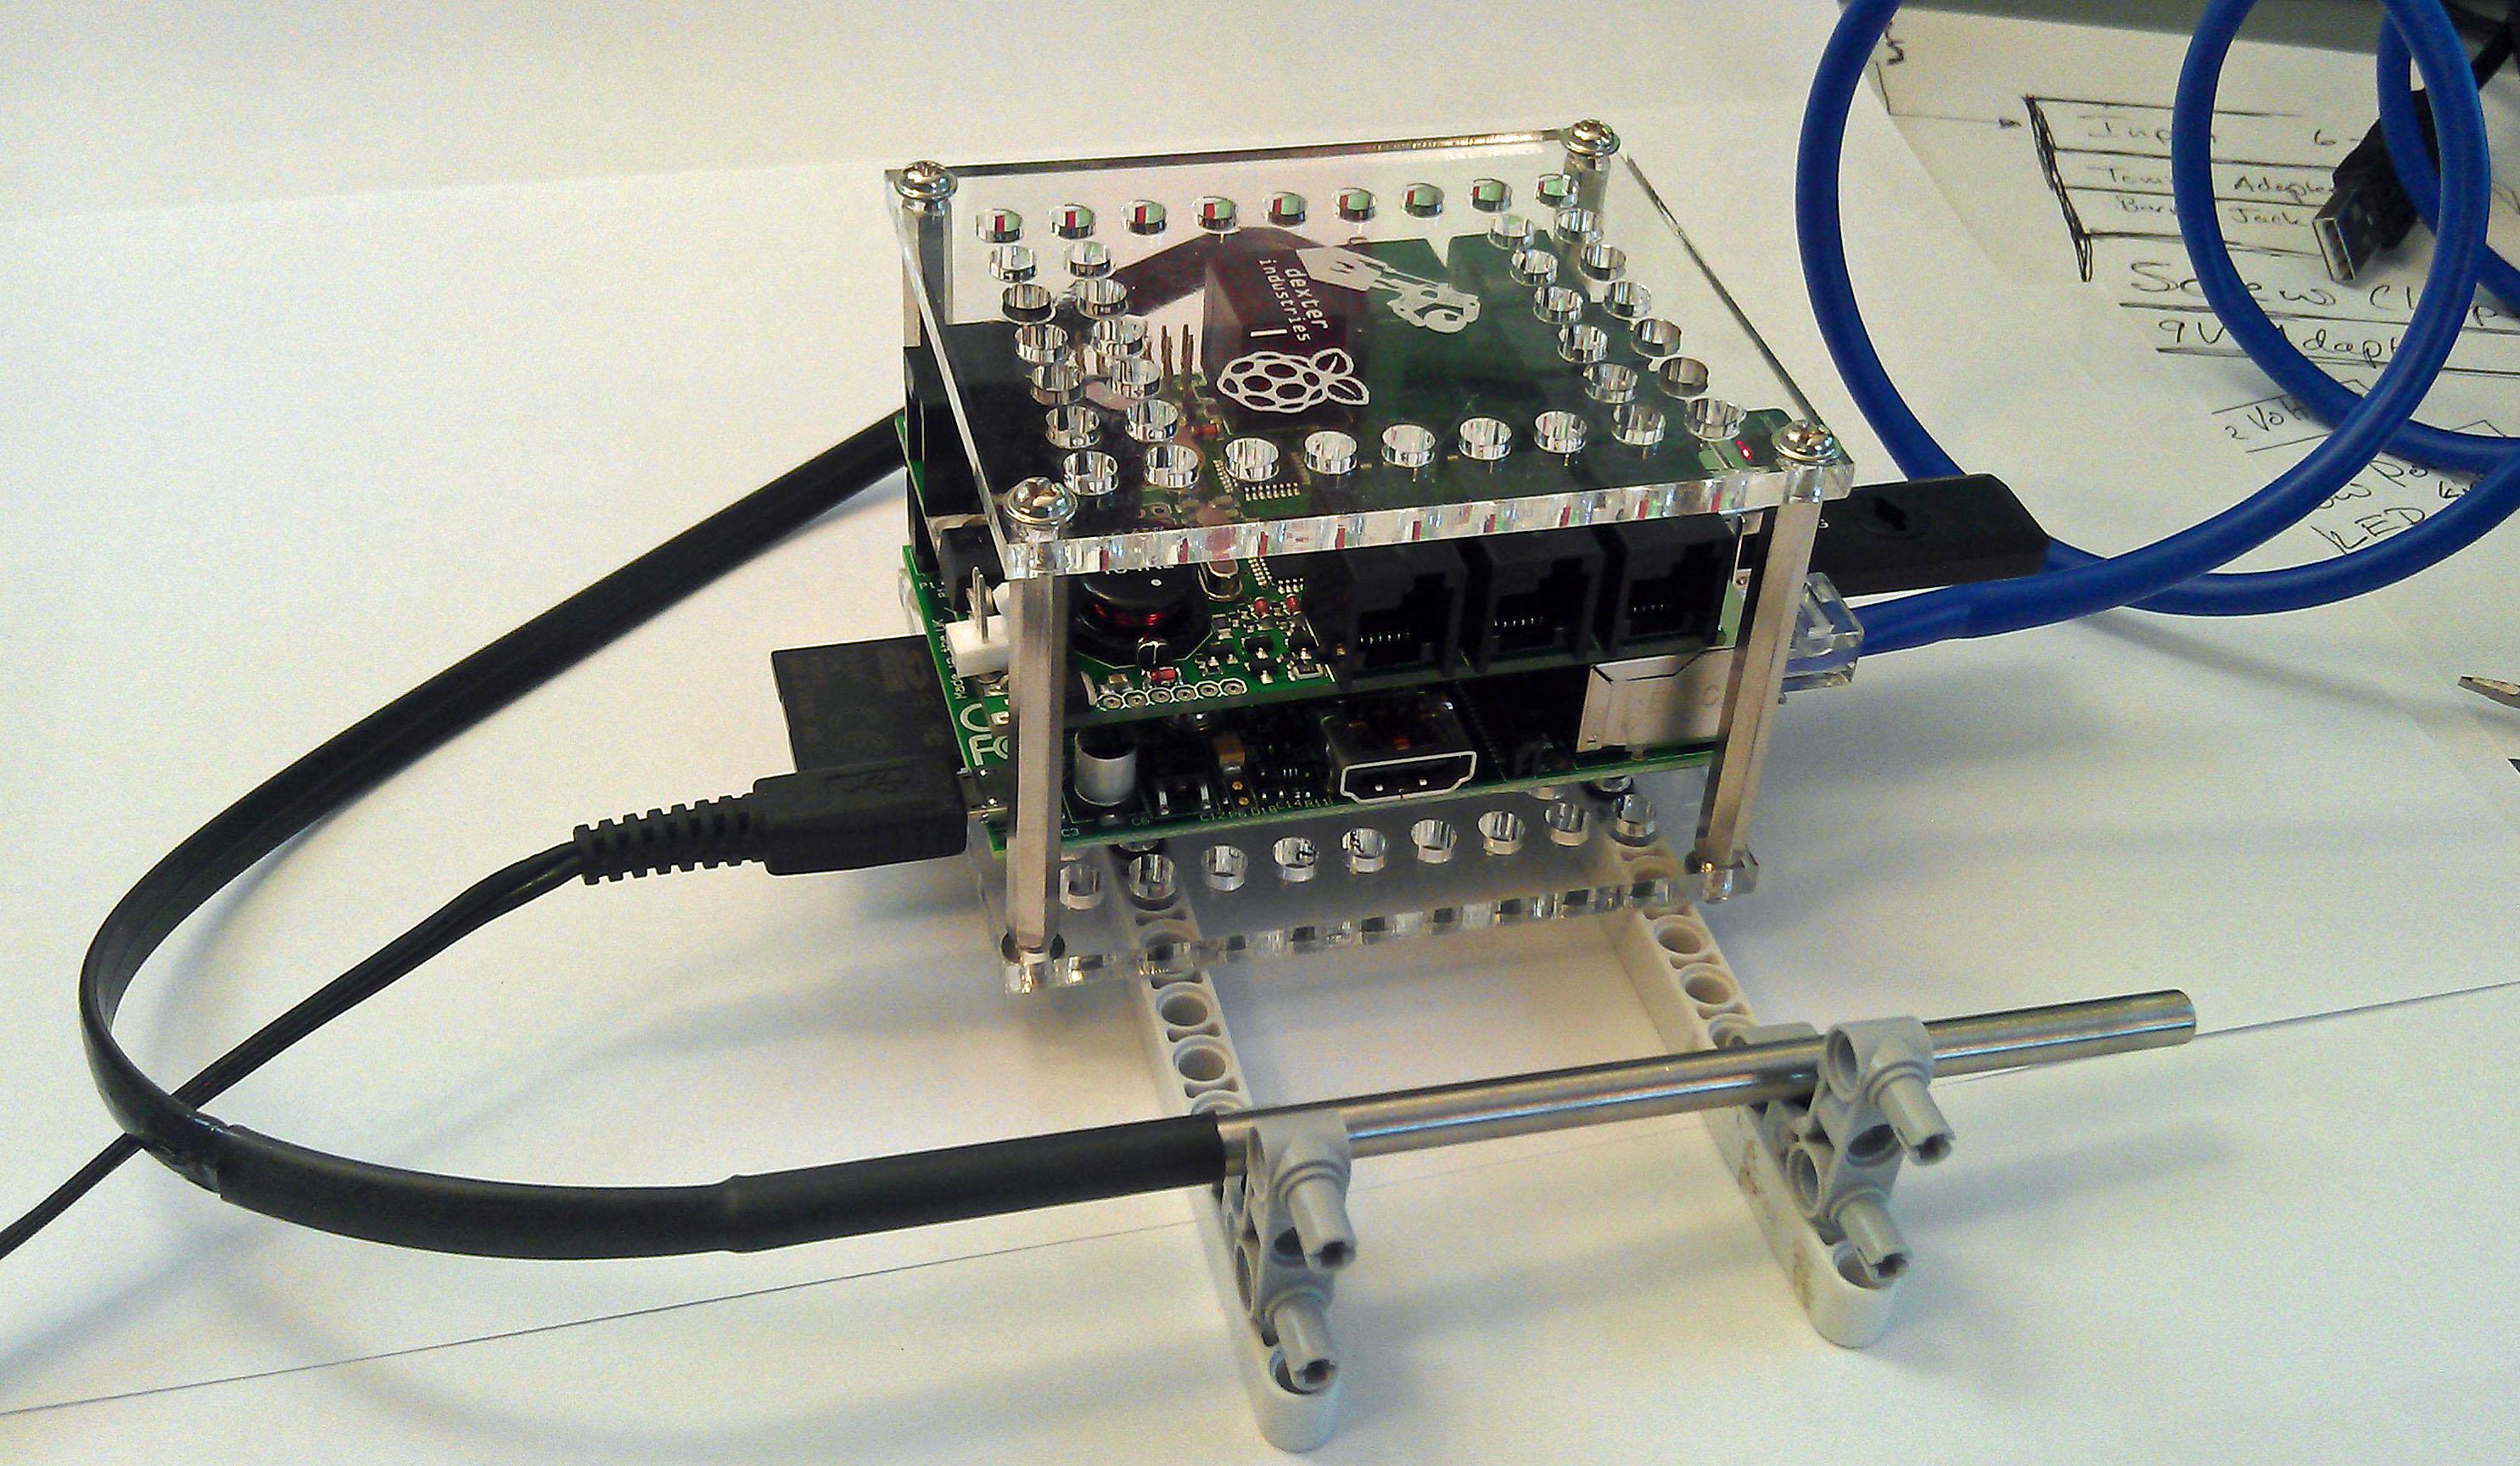 BrickPi Weather Station using ThingSpeak and the Raspberry Pi